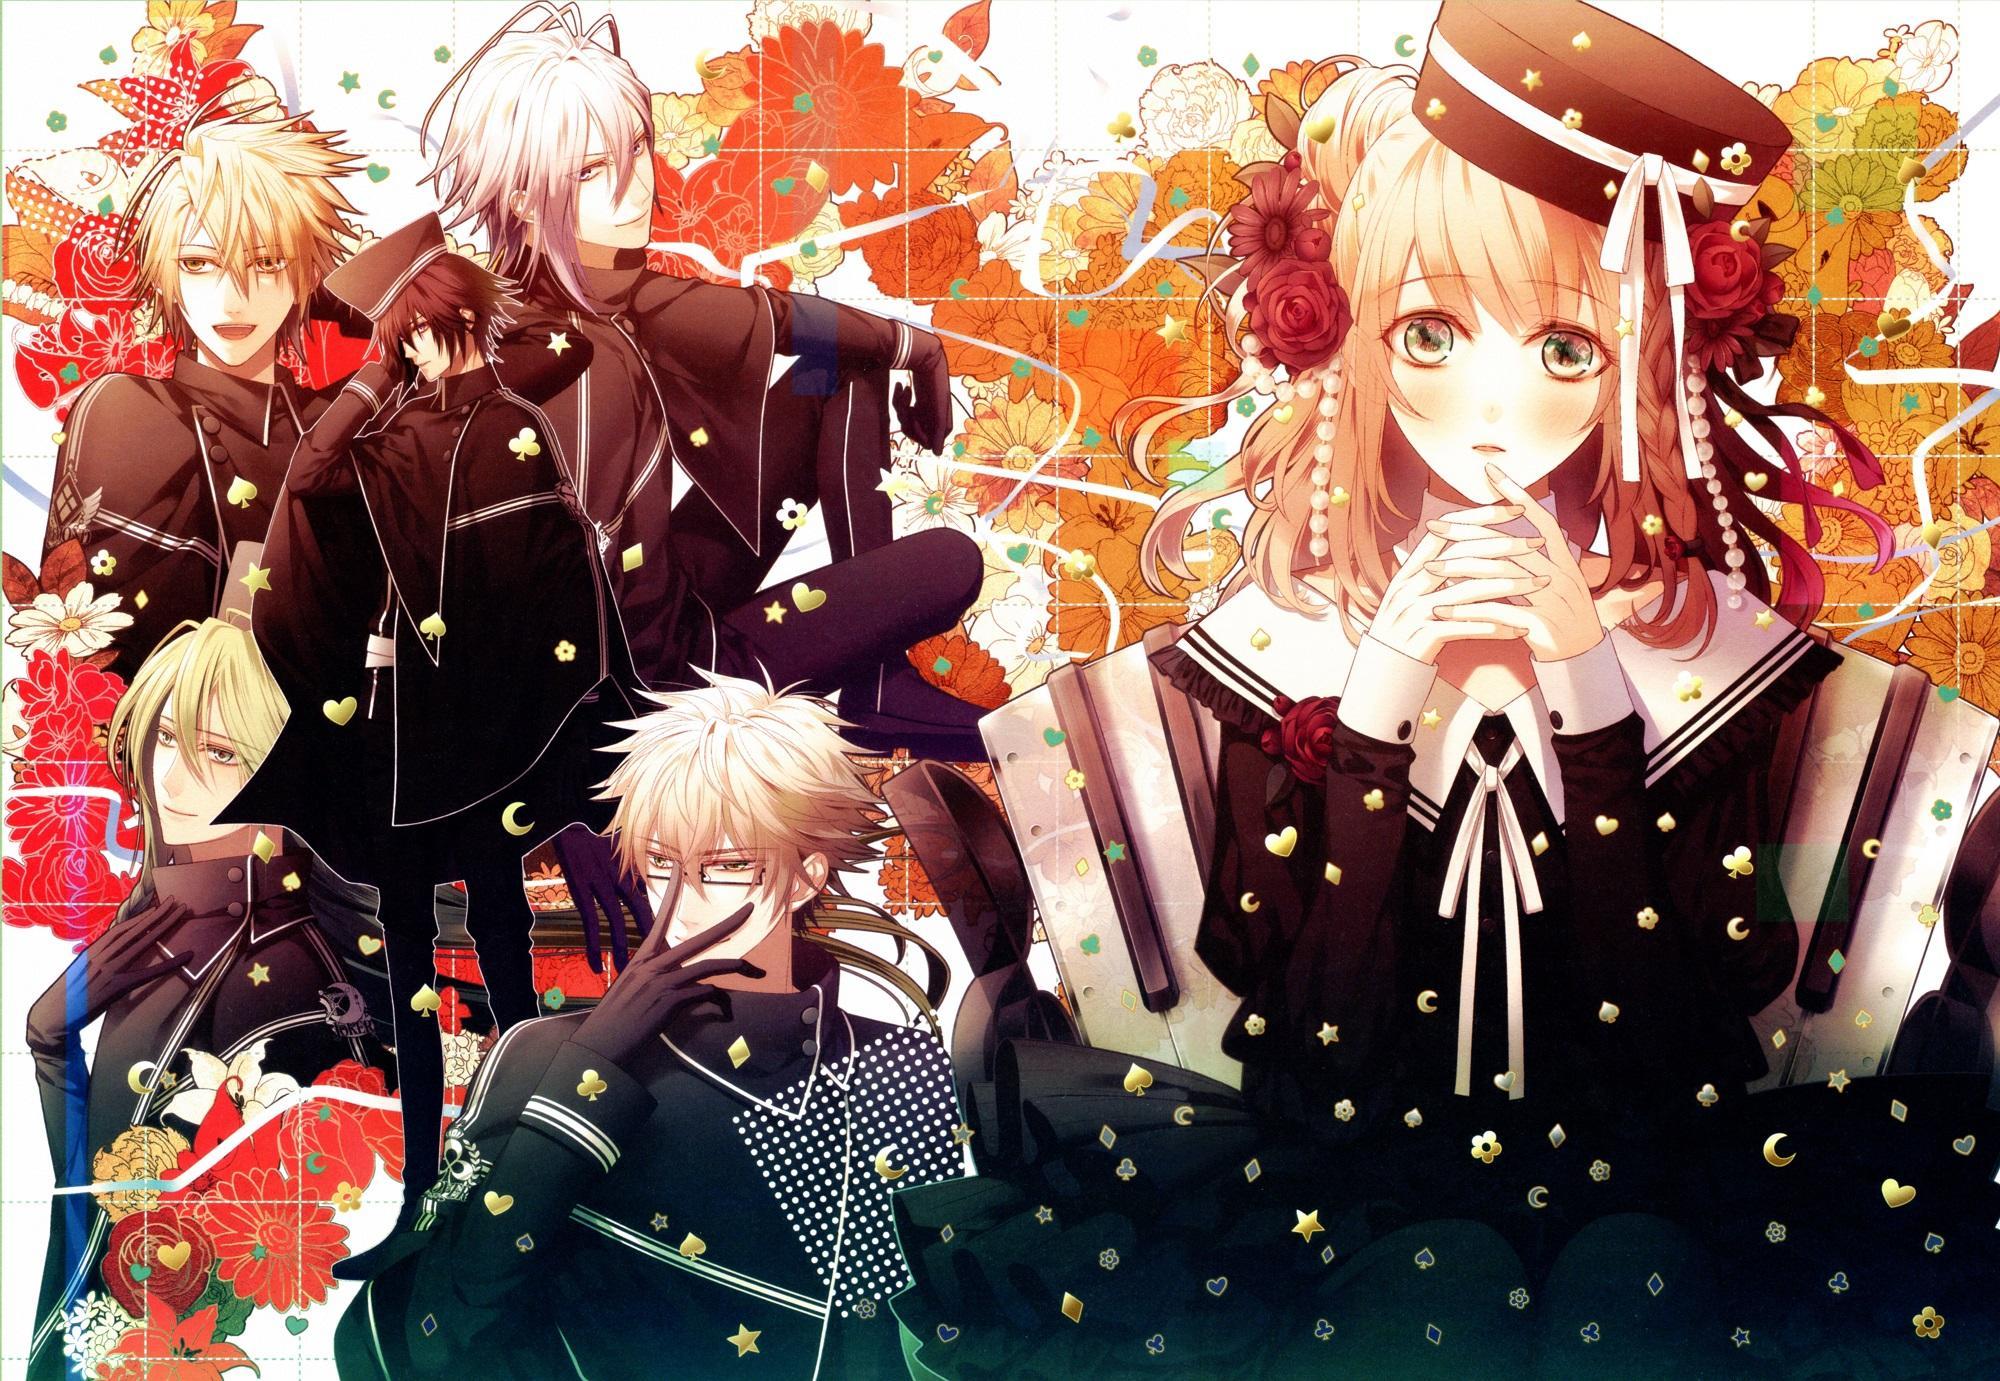 Amnesia Anime Wallpaper - WallpaperSafari